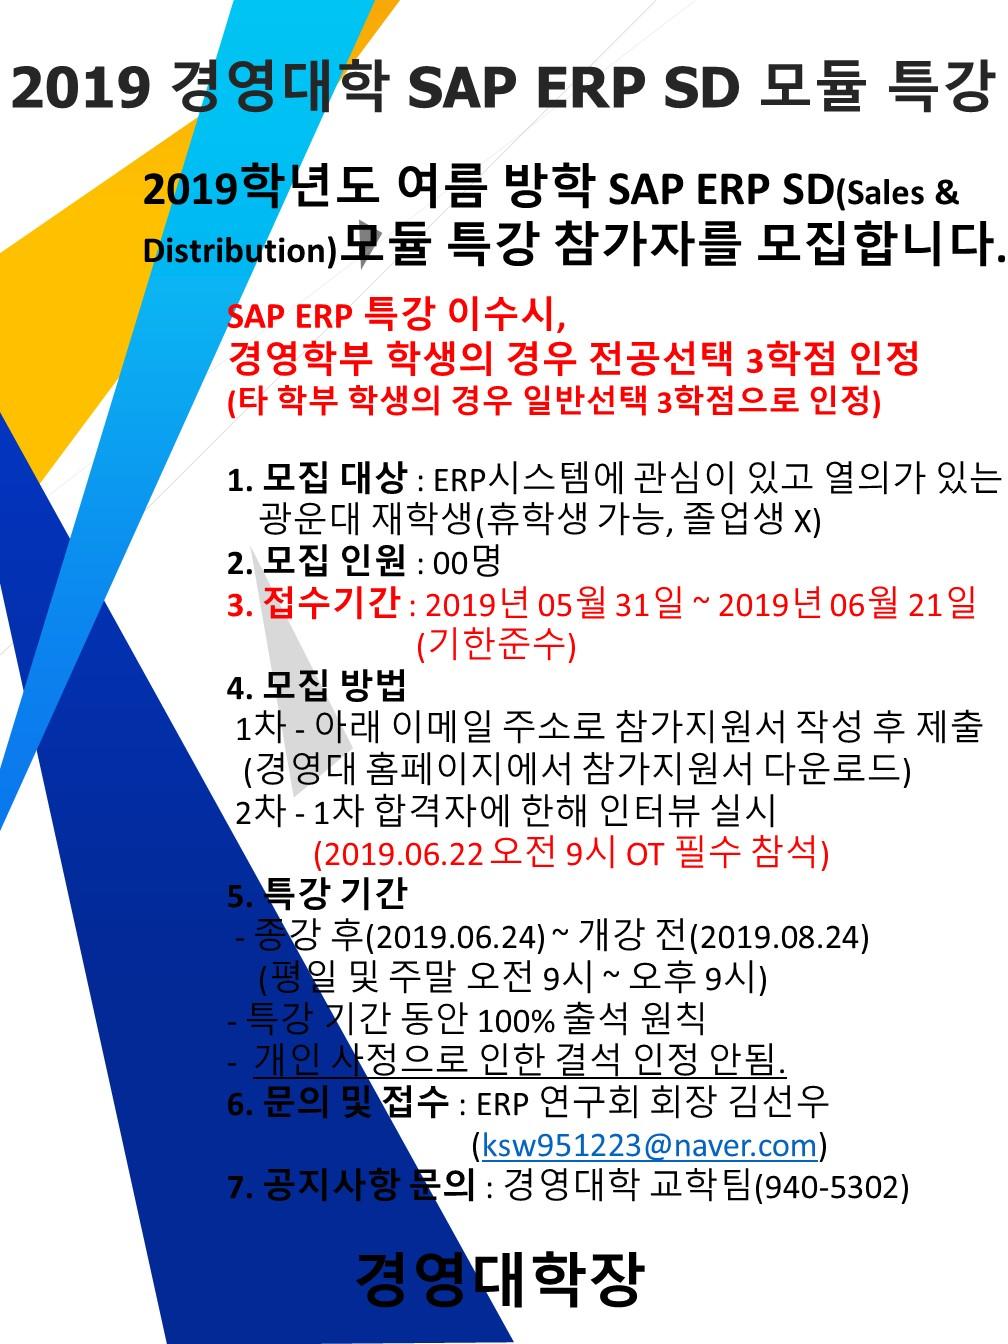 2019_ERP_SD_특강_공고문.JPG